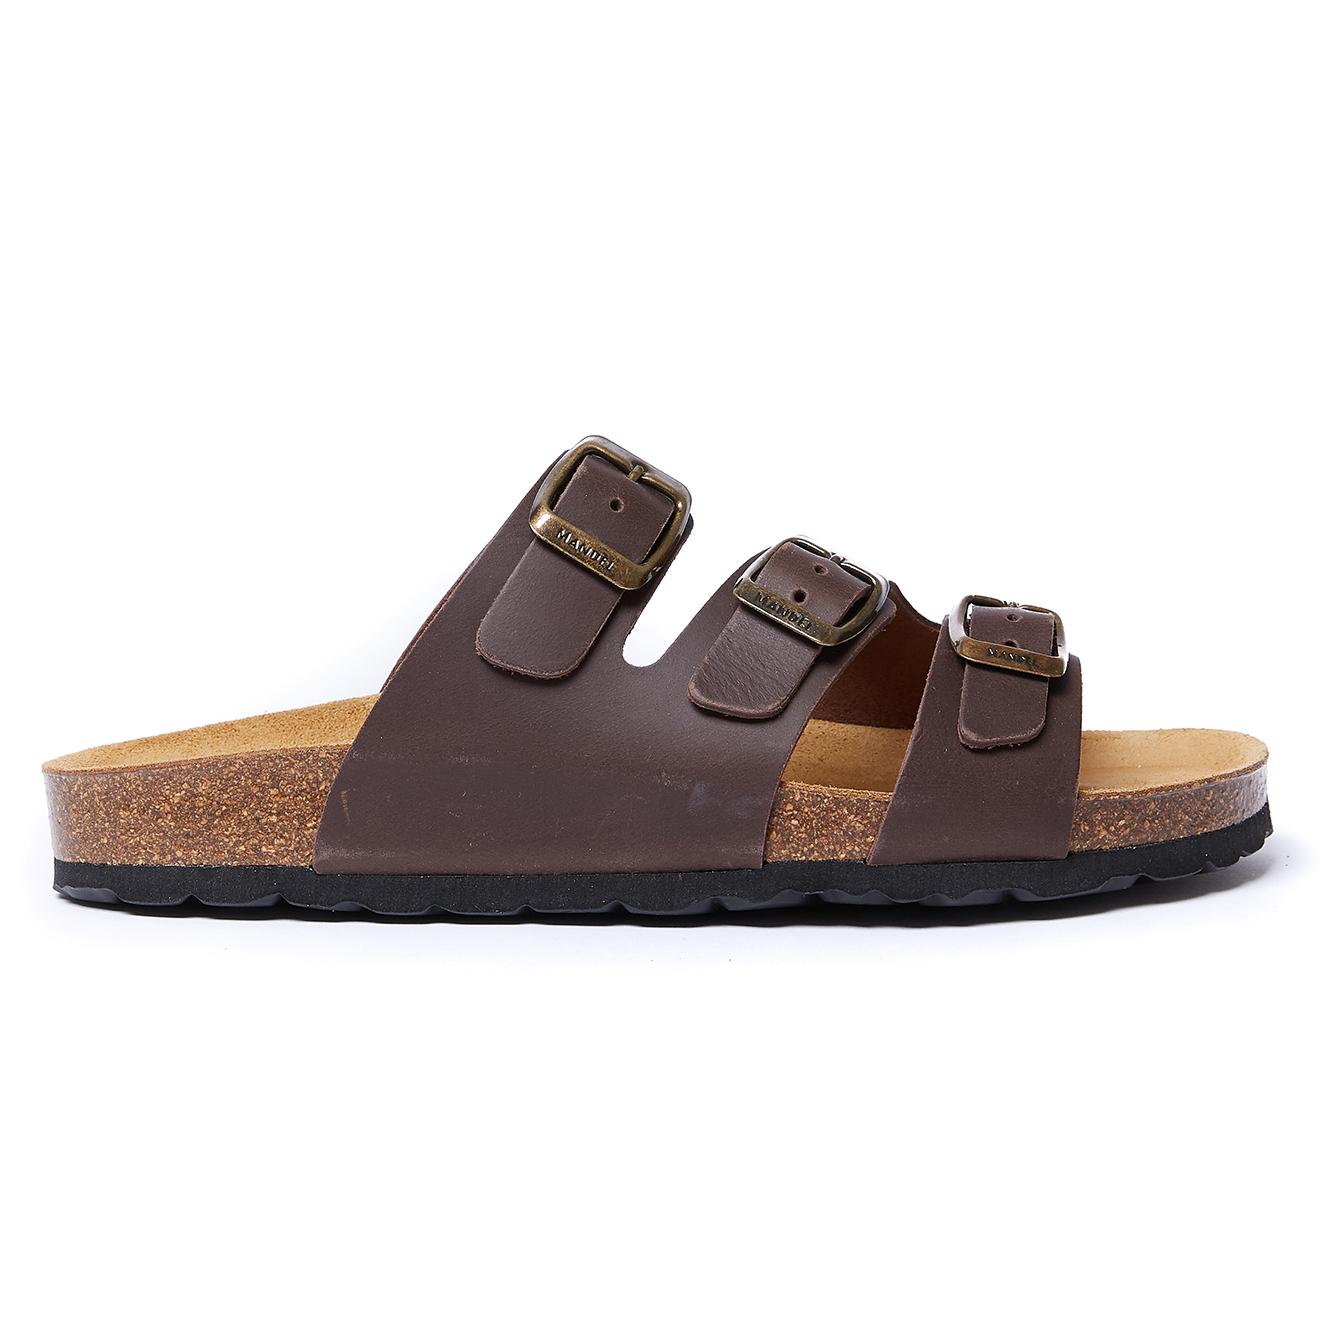 Sandales en Cuir Paco marron foncé